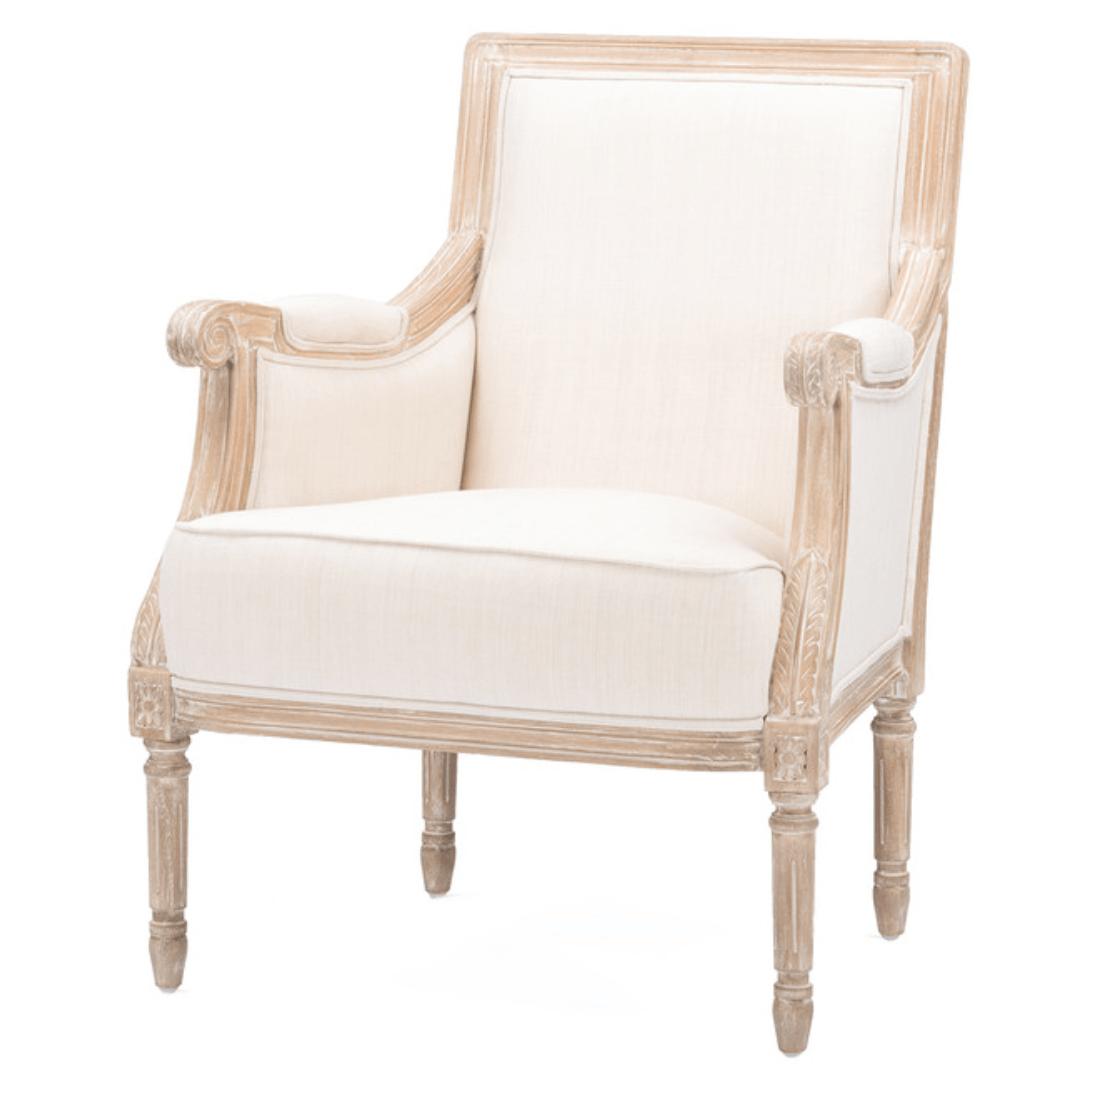 BBB Chavanon chair 362